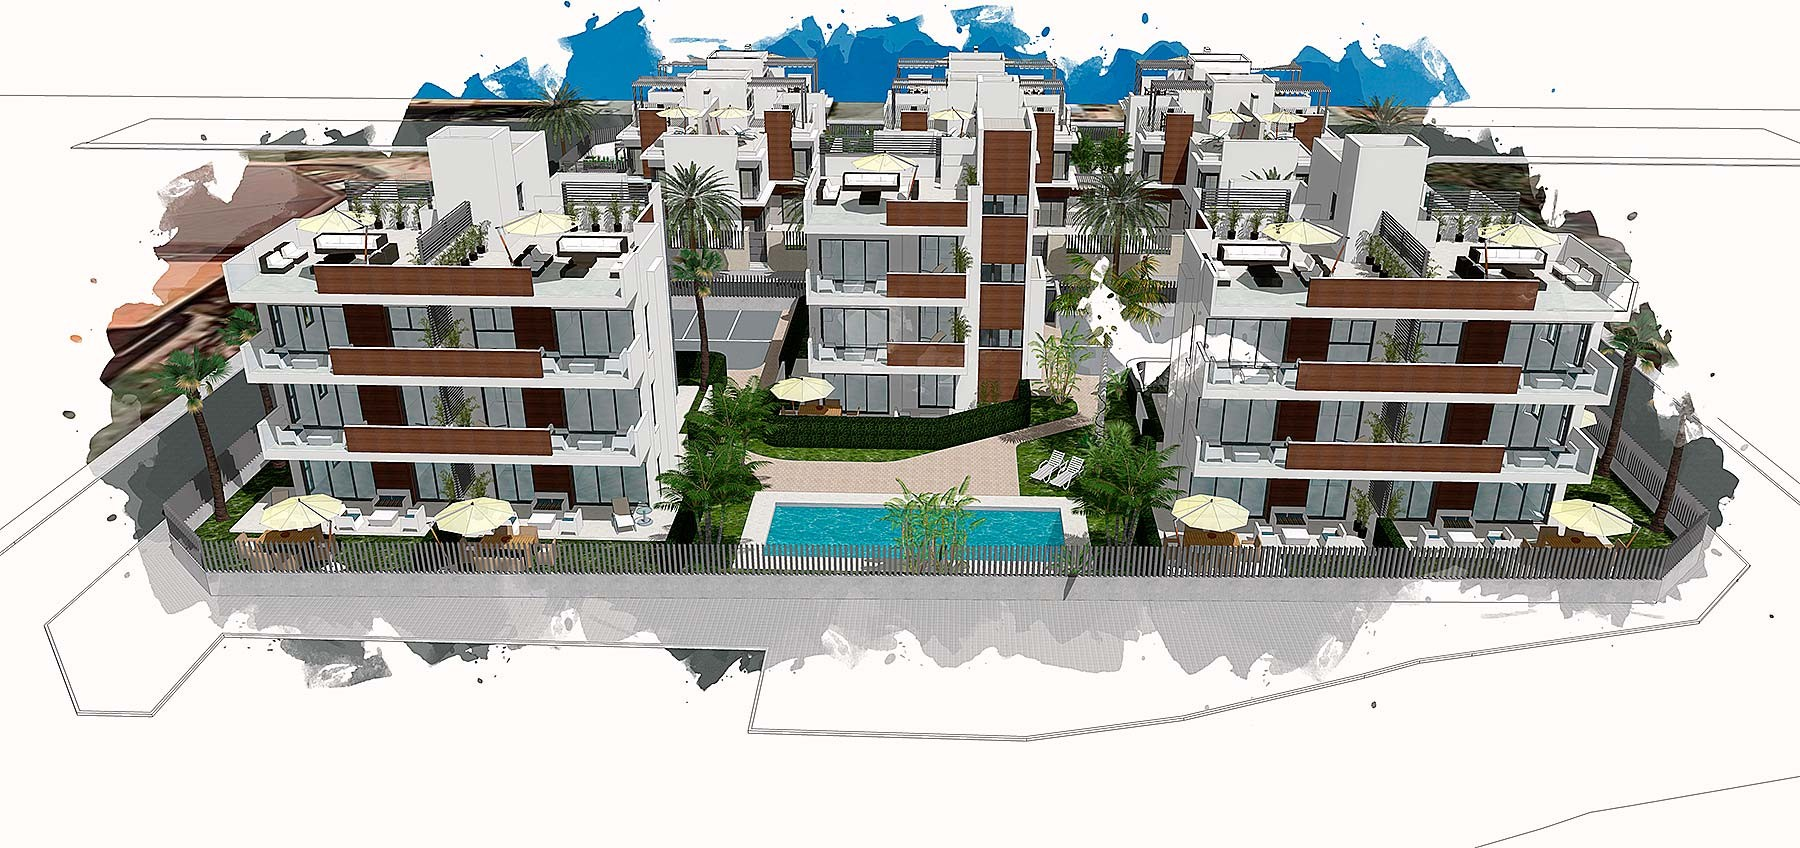 Апартаменты в Ла-Манга-дель-Мар-Менор